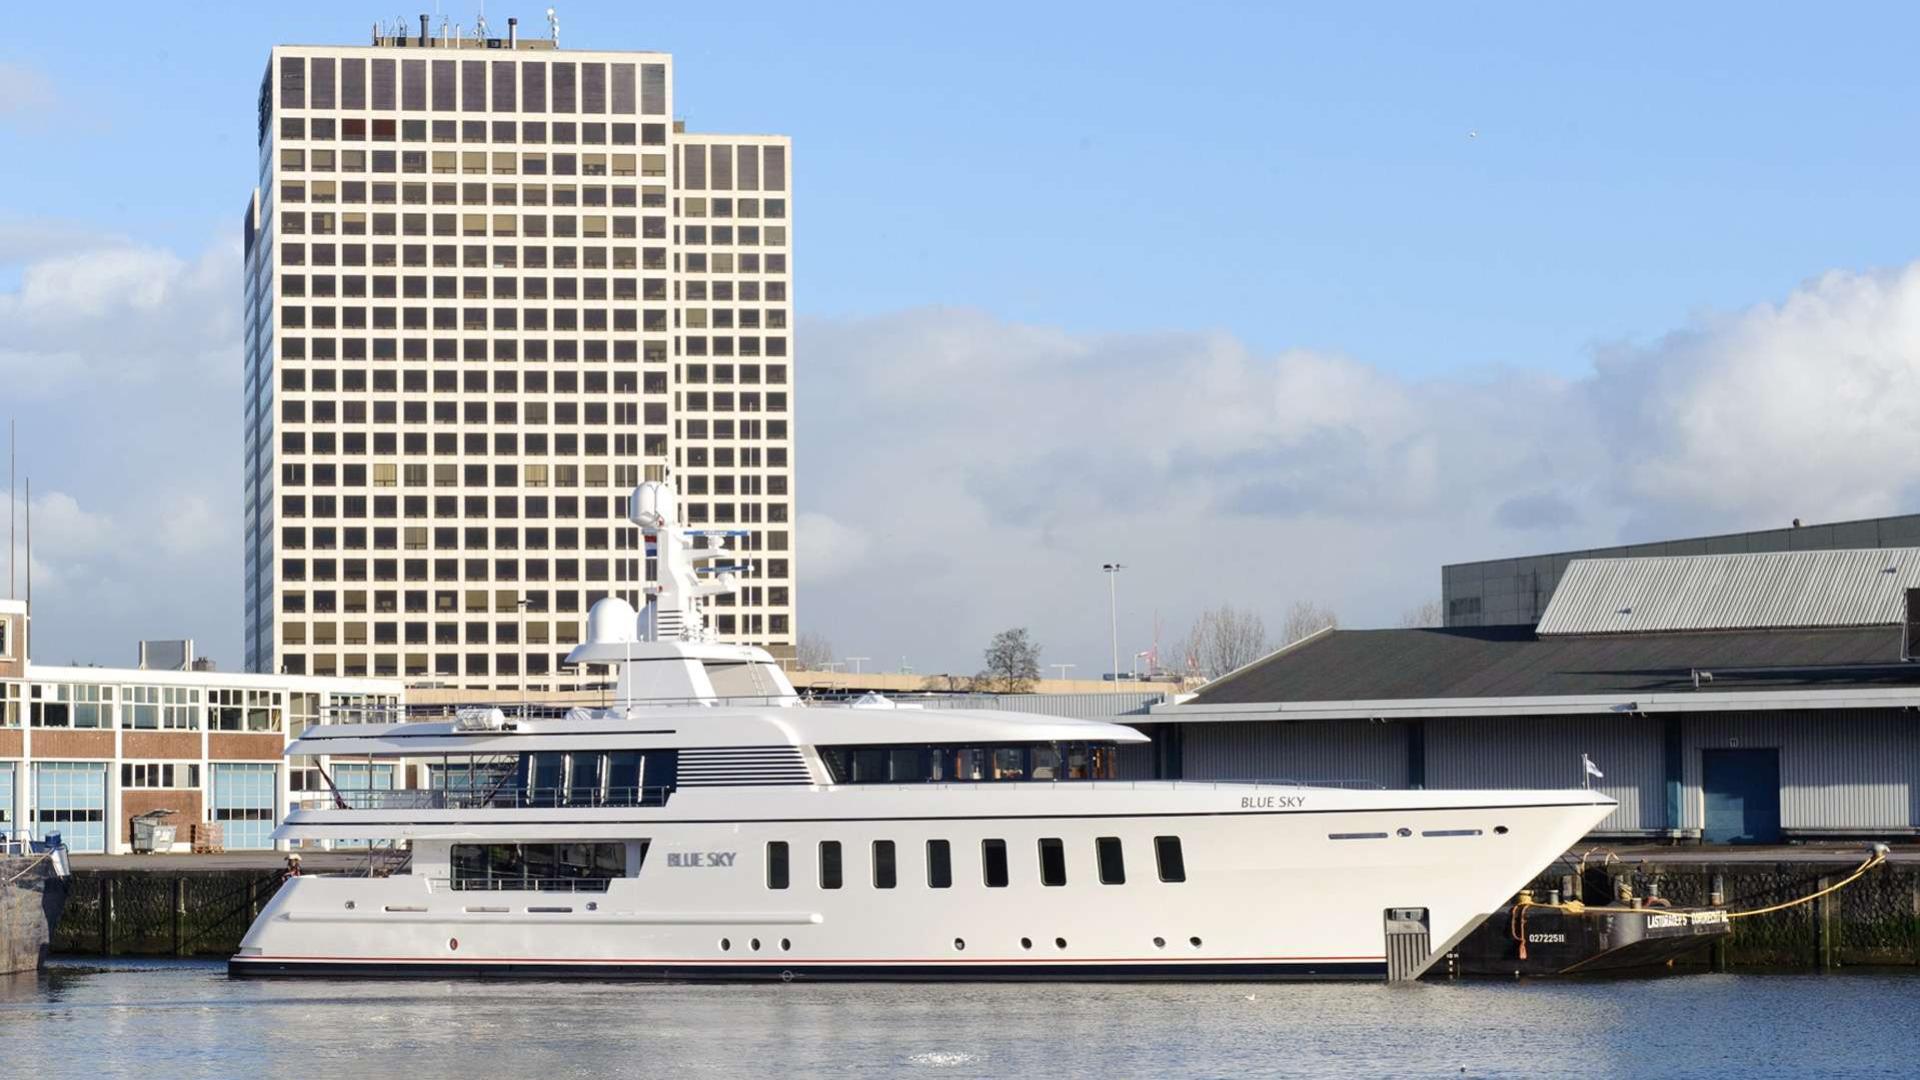 blue-sky-motor-yacht-feadship-f45-vantage-2013-45m-profile